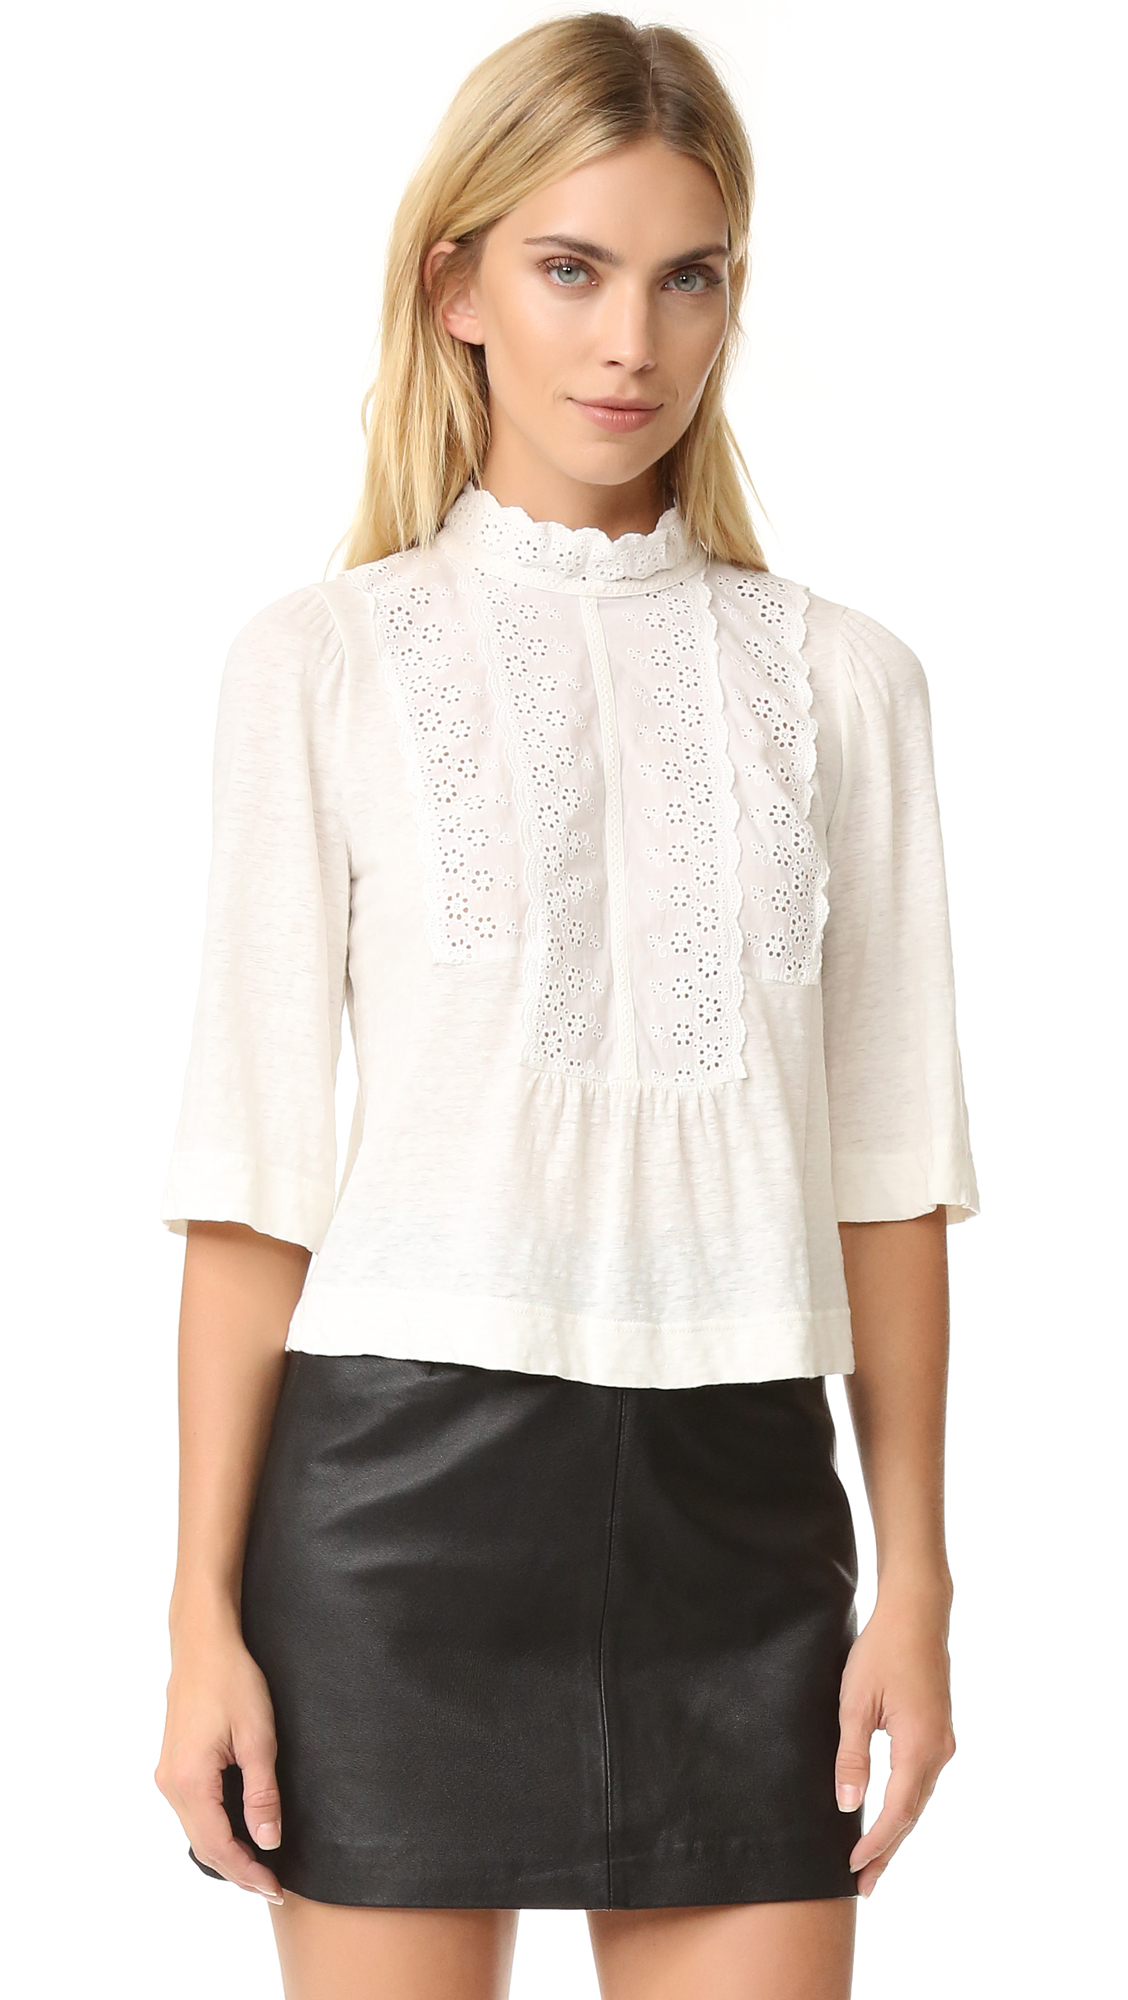 La Vie Rebecca Taylor Long Sleeve Linen And Lace Tee - Chalk at Shopbop